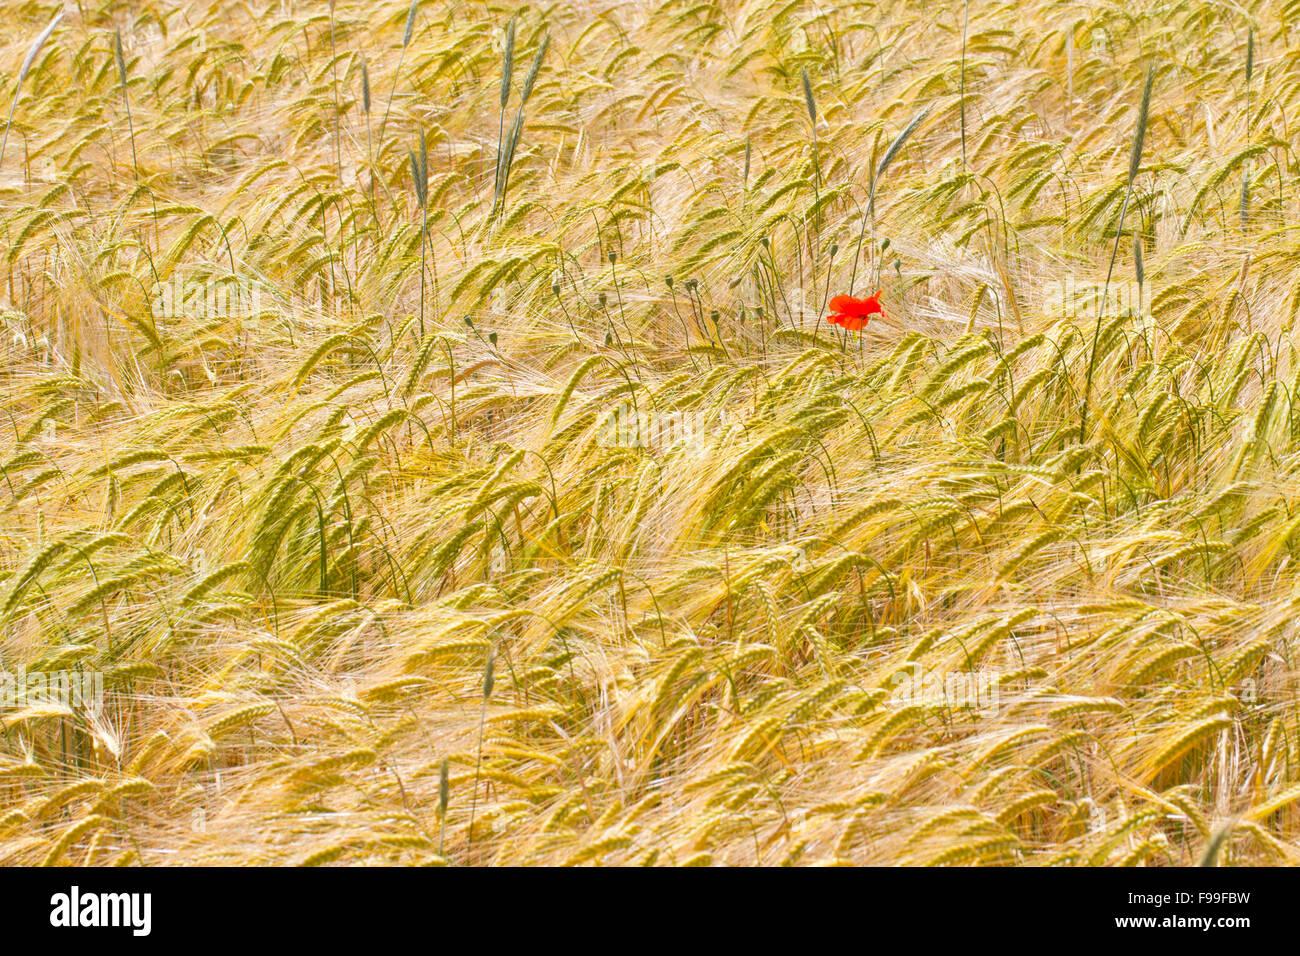 Corn Poppy (Papaver rhoeas), single flower in a crop of Durum wheat (Triticum durum). Causse de Gramat, Lot region, - Stock Image